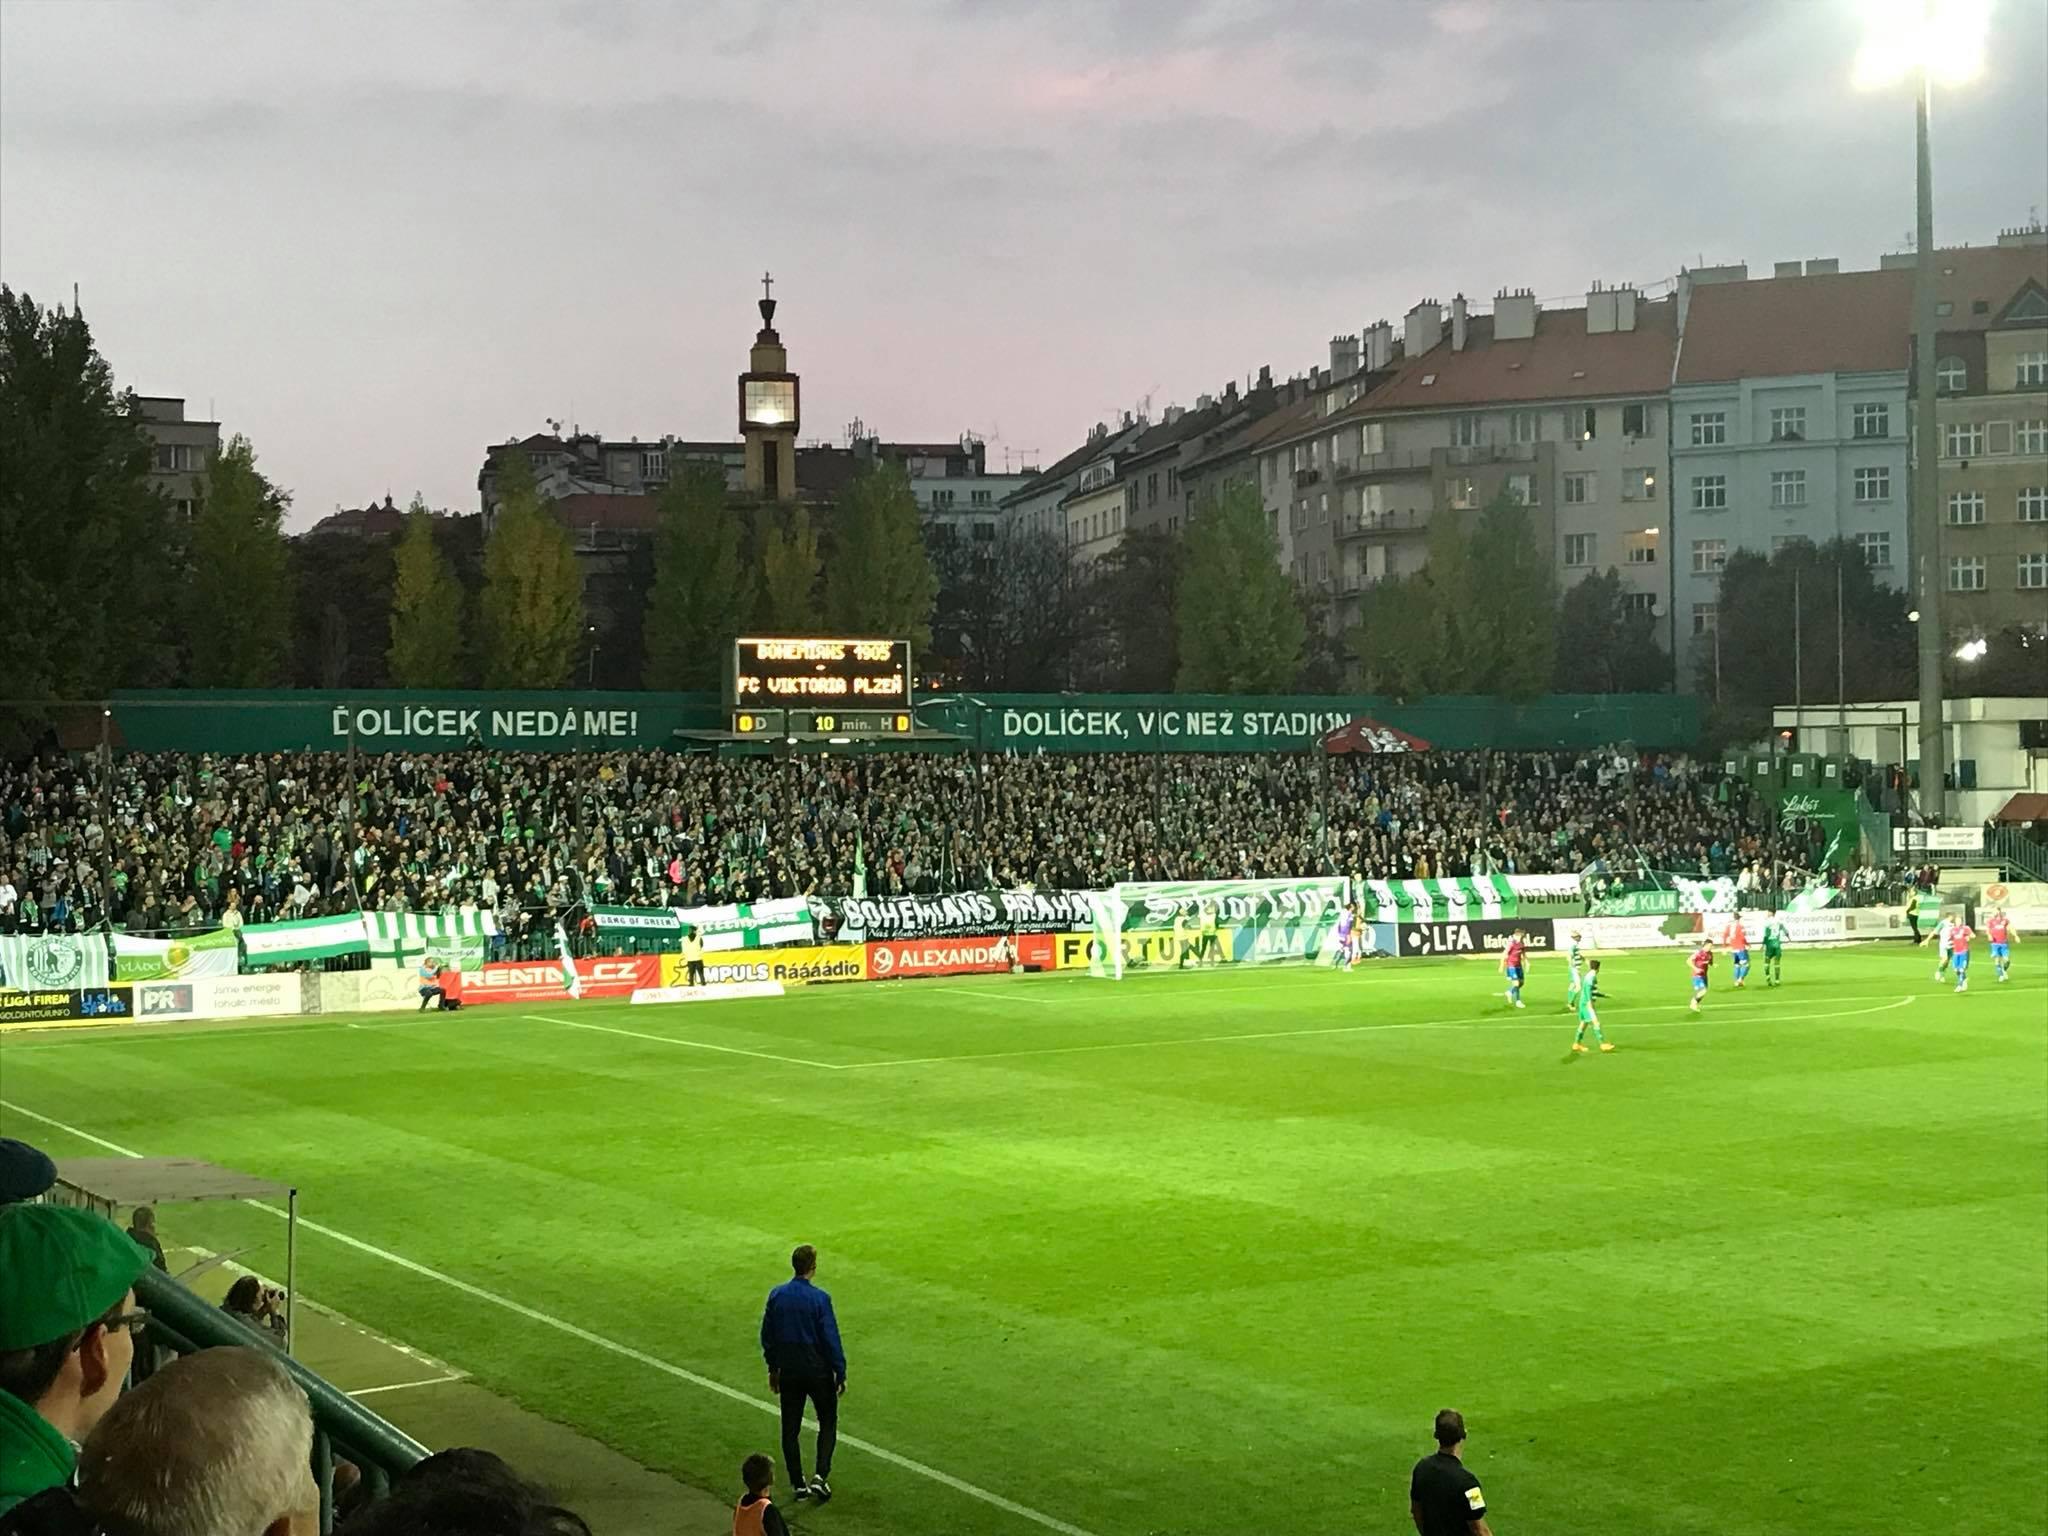 Bohemians Praha 1905 – FC Viktoria Plzeň 2:2